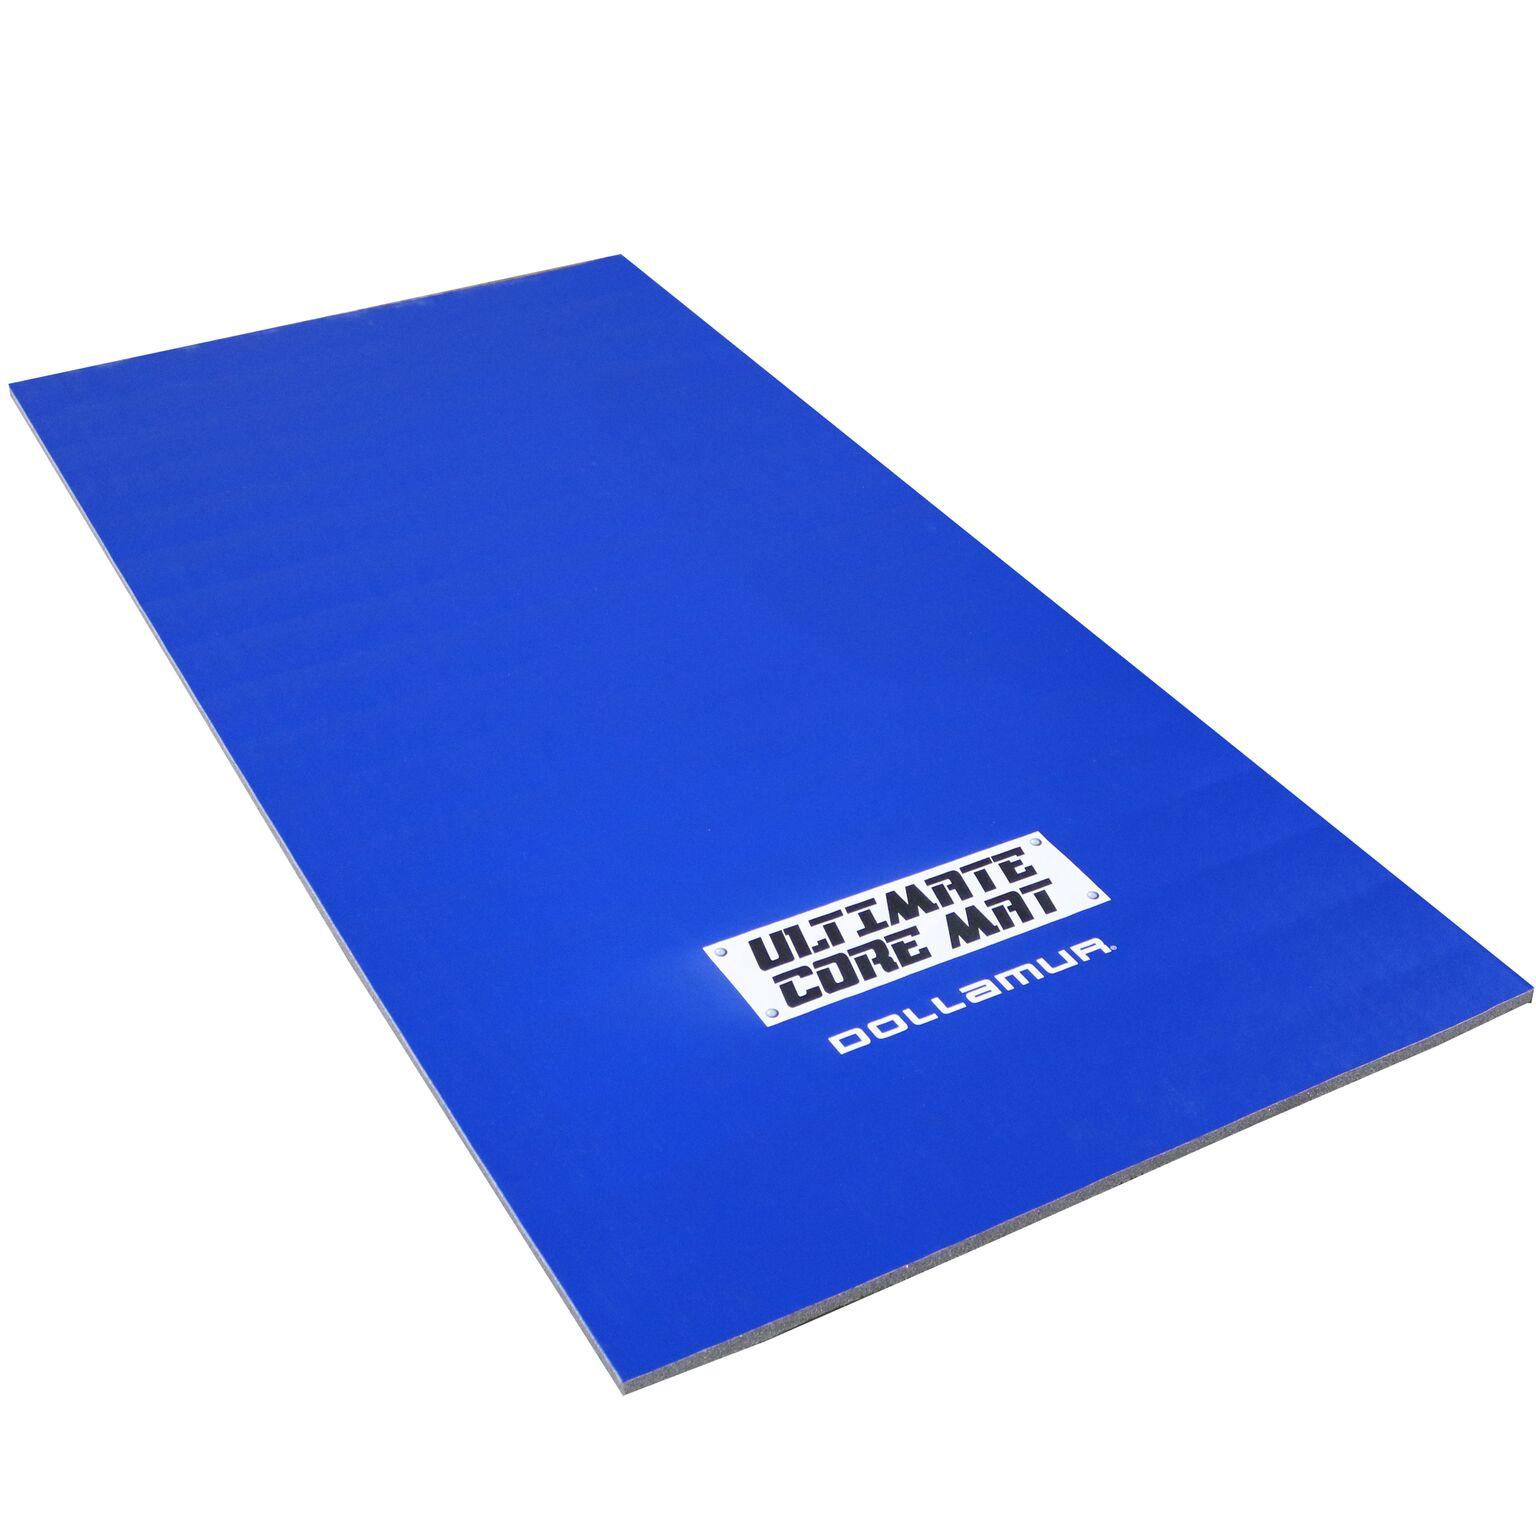 Fitness Mat, 3'x6', Royal Blue